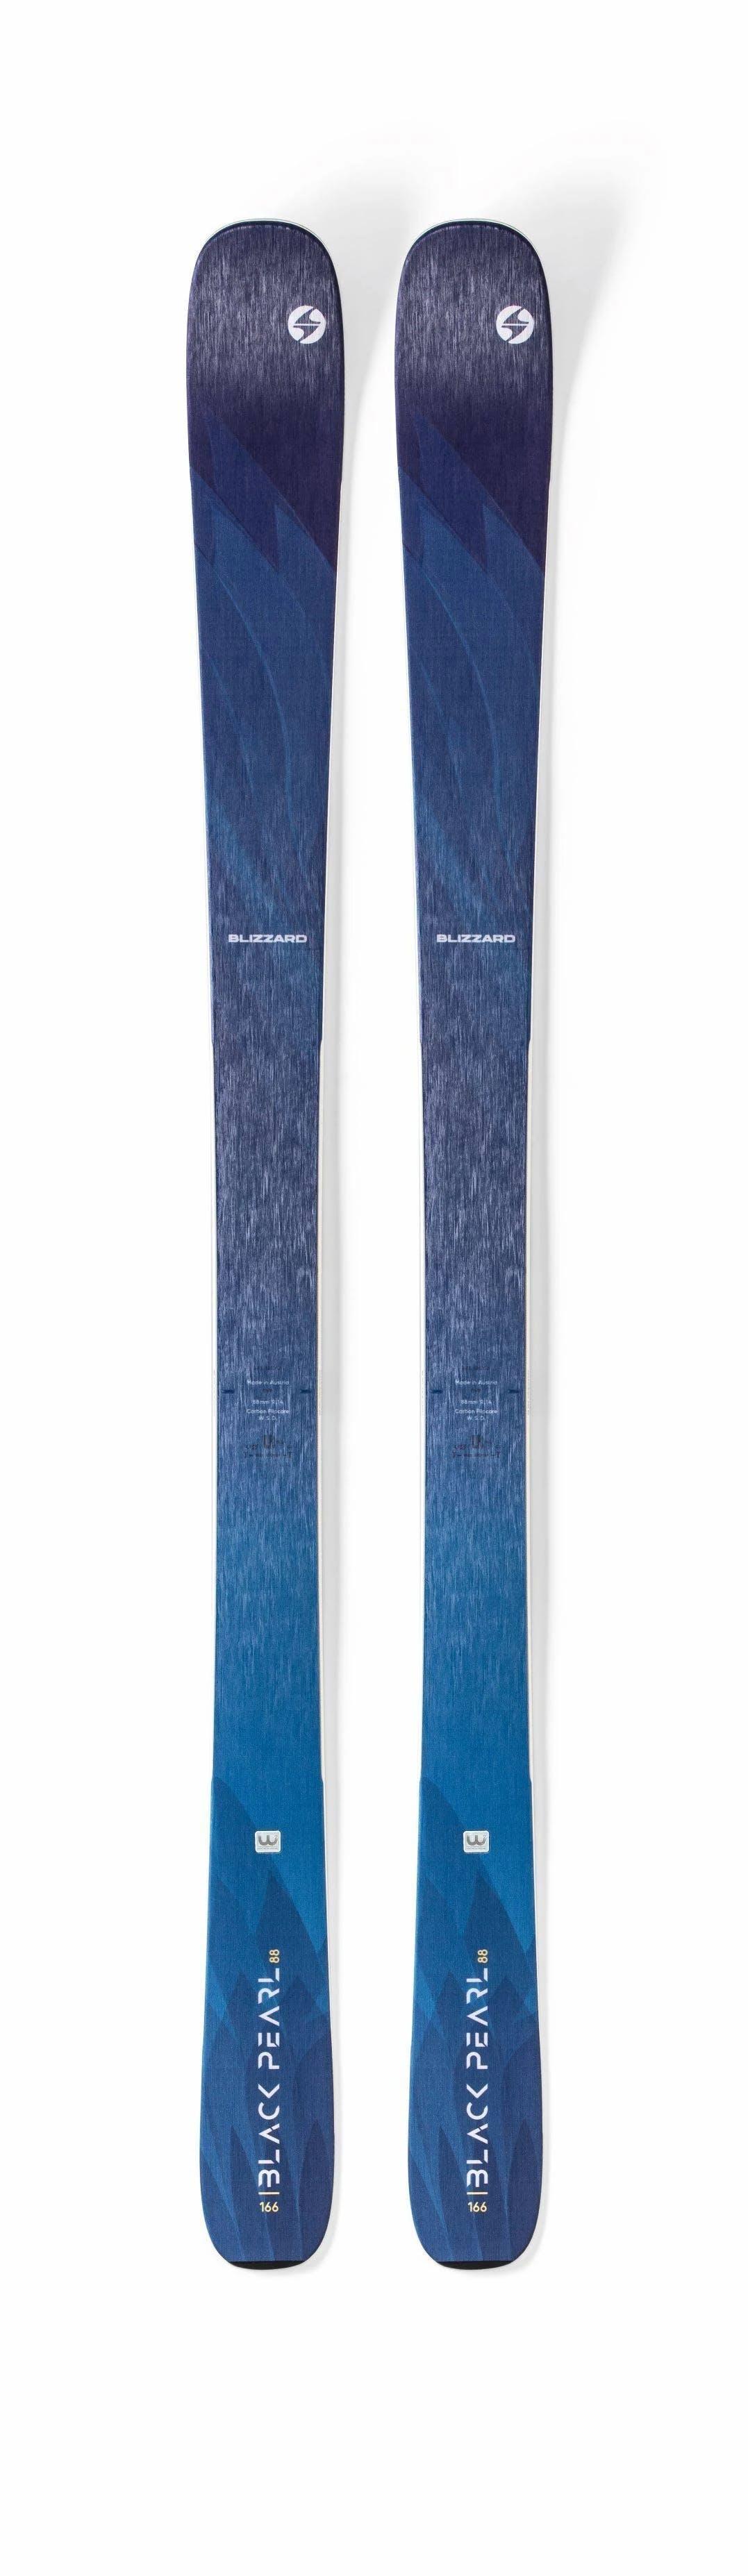 Blizzard Black Pearl 88 Skis